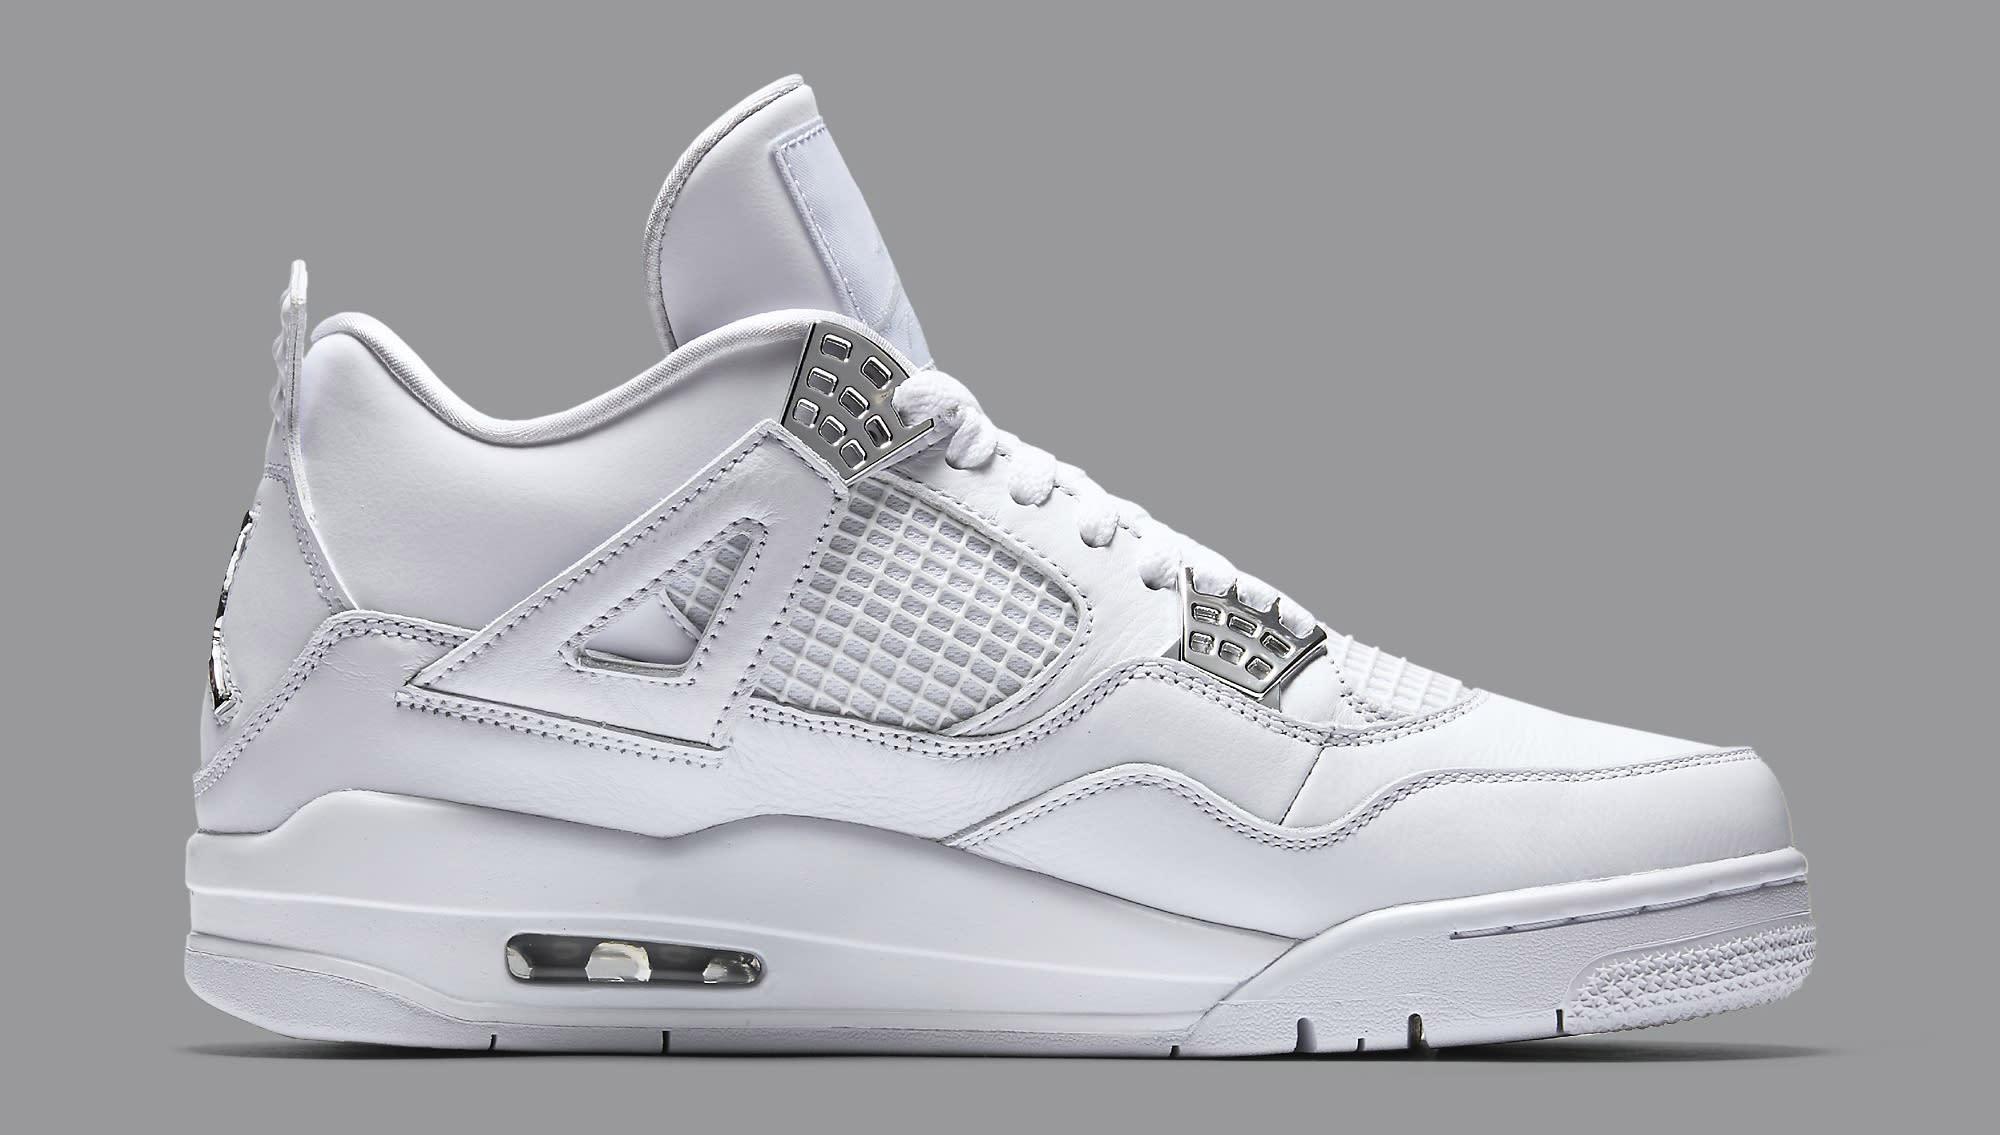 a6df232de8fbfe Image via Nike Pure Money Air Jordan 4 308497-100 Medial